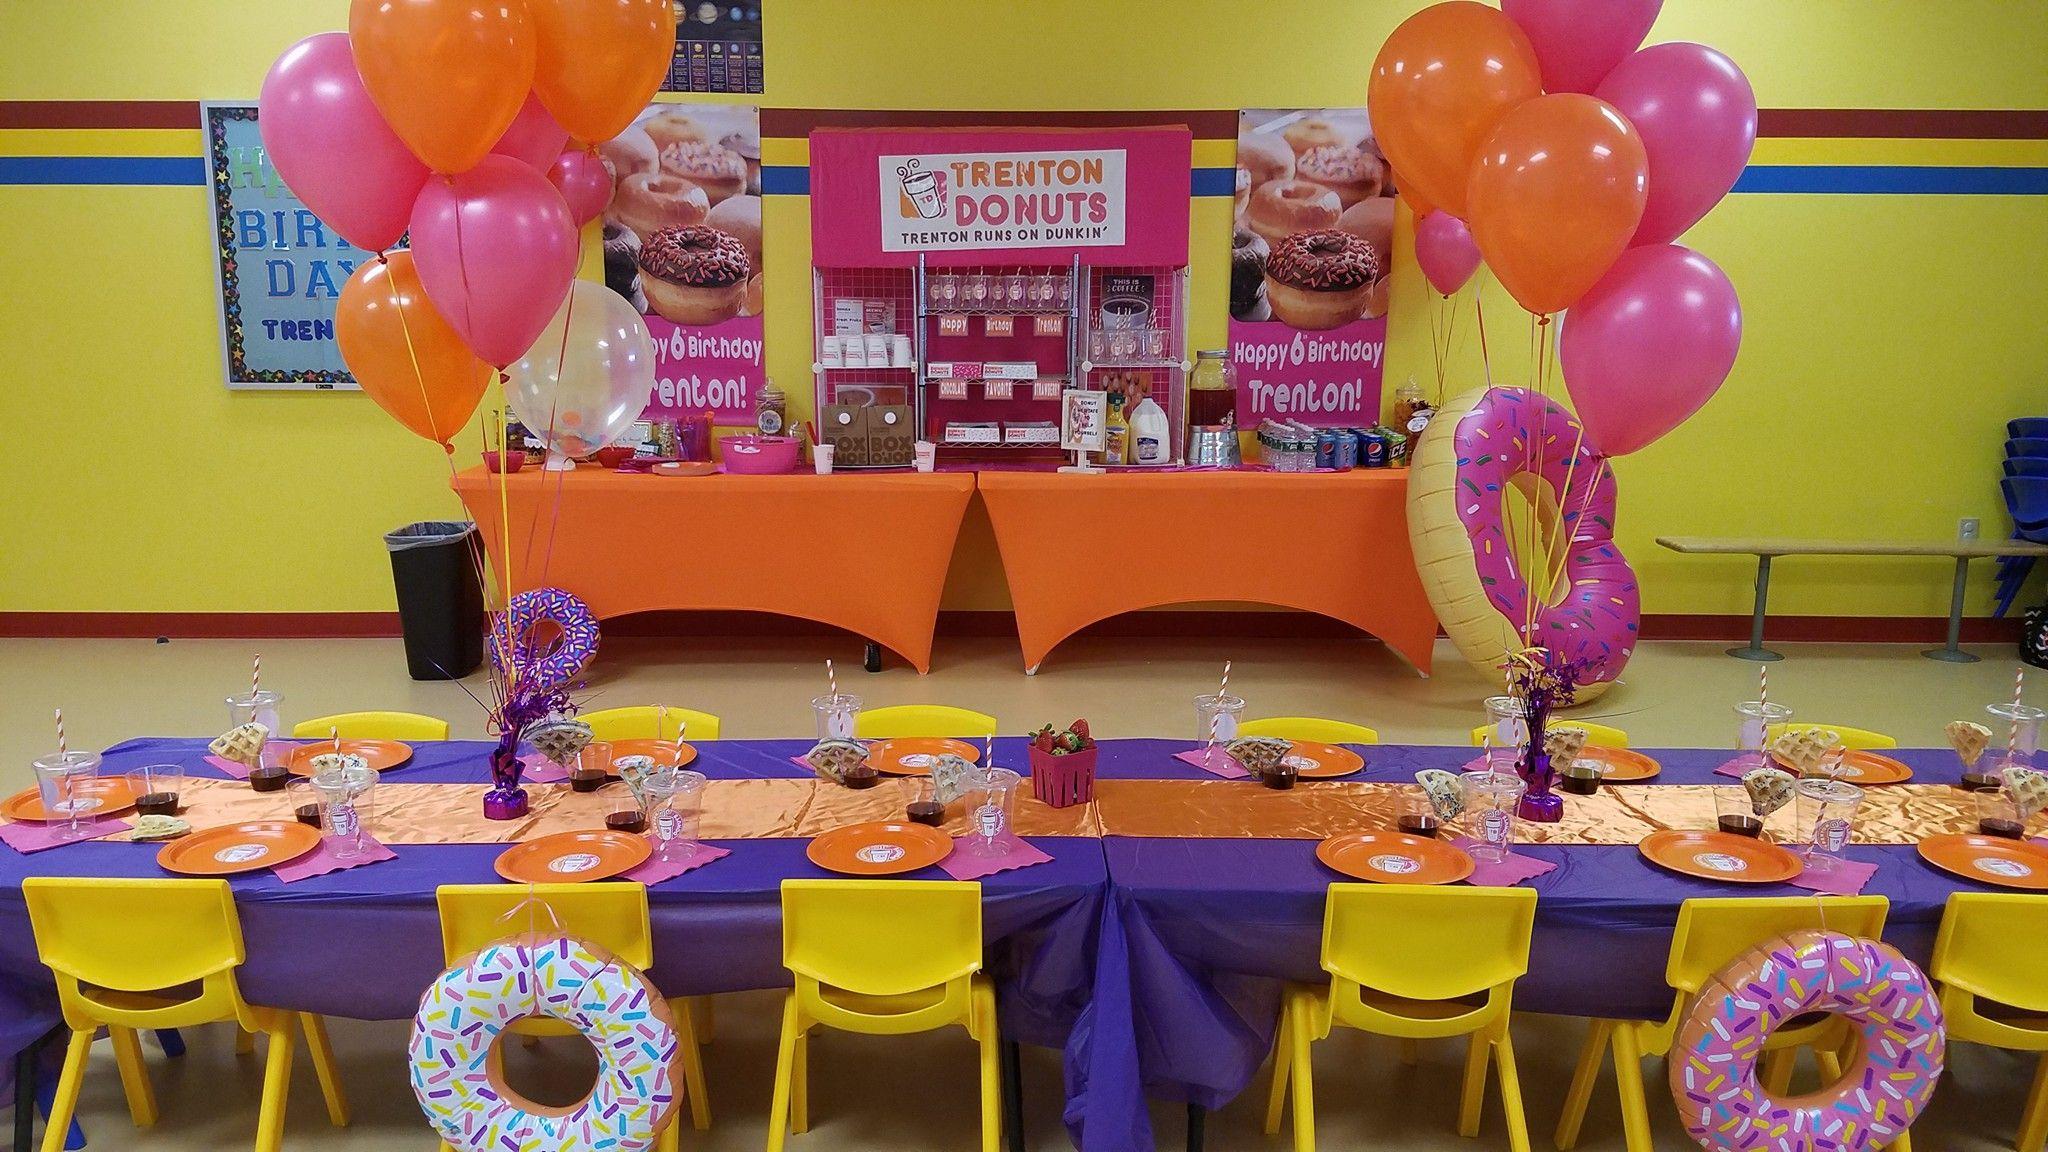 Donut party set up 6th birthday donut birthday parties